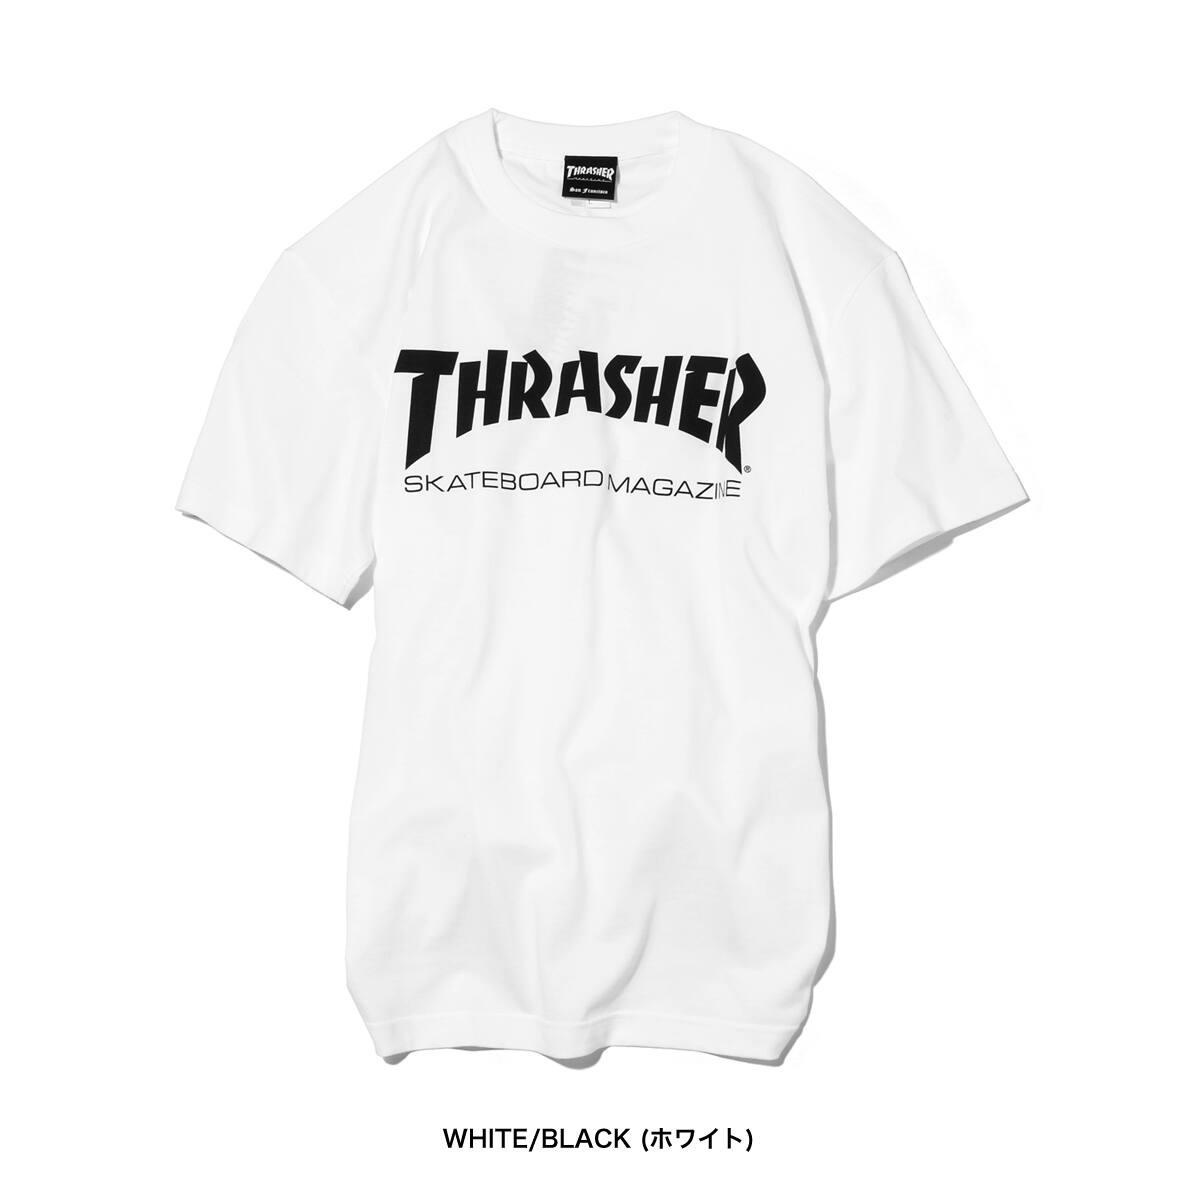 """THRASHER MAG LOGO T-SHIRTWHITE/BLACK/RED 18FW-I""_photo_2"